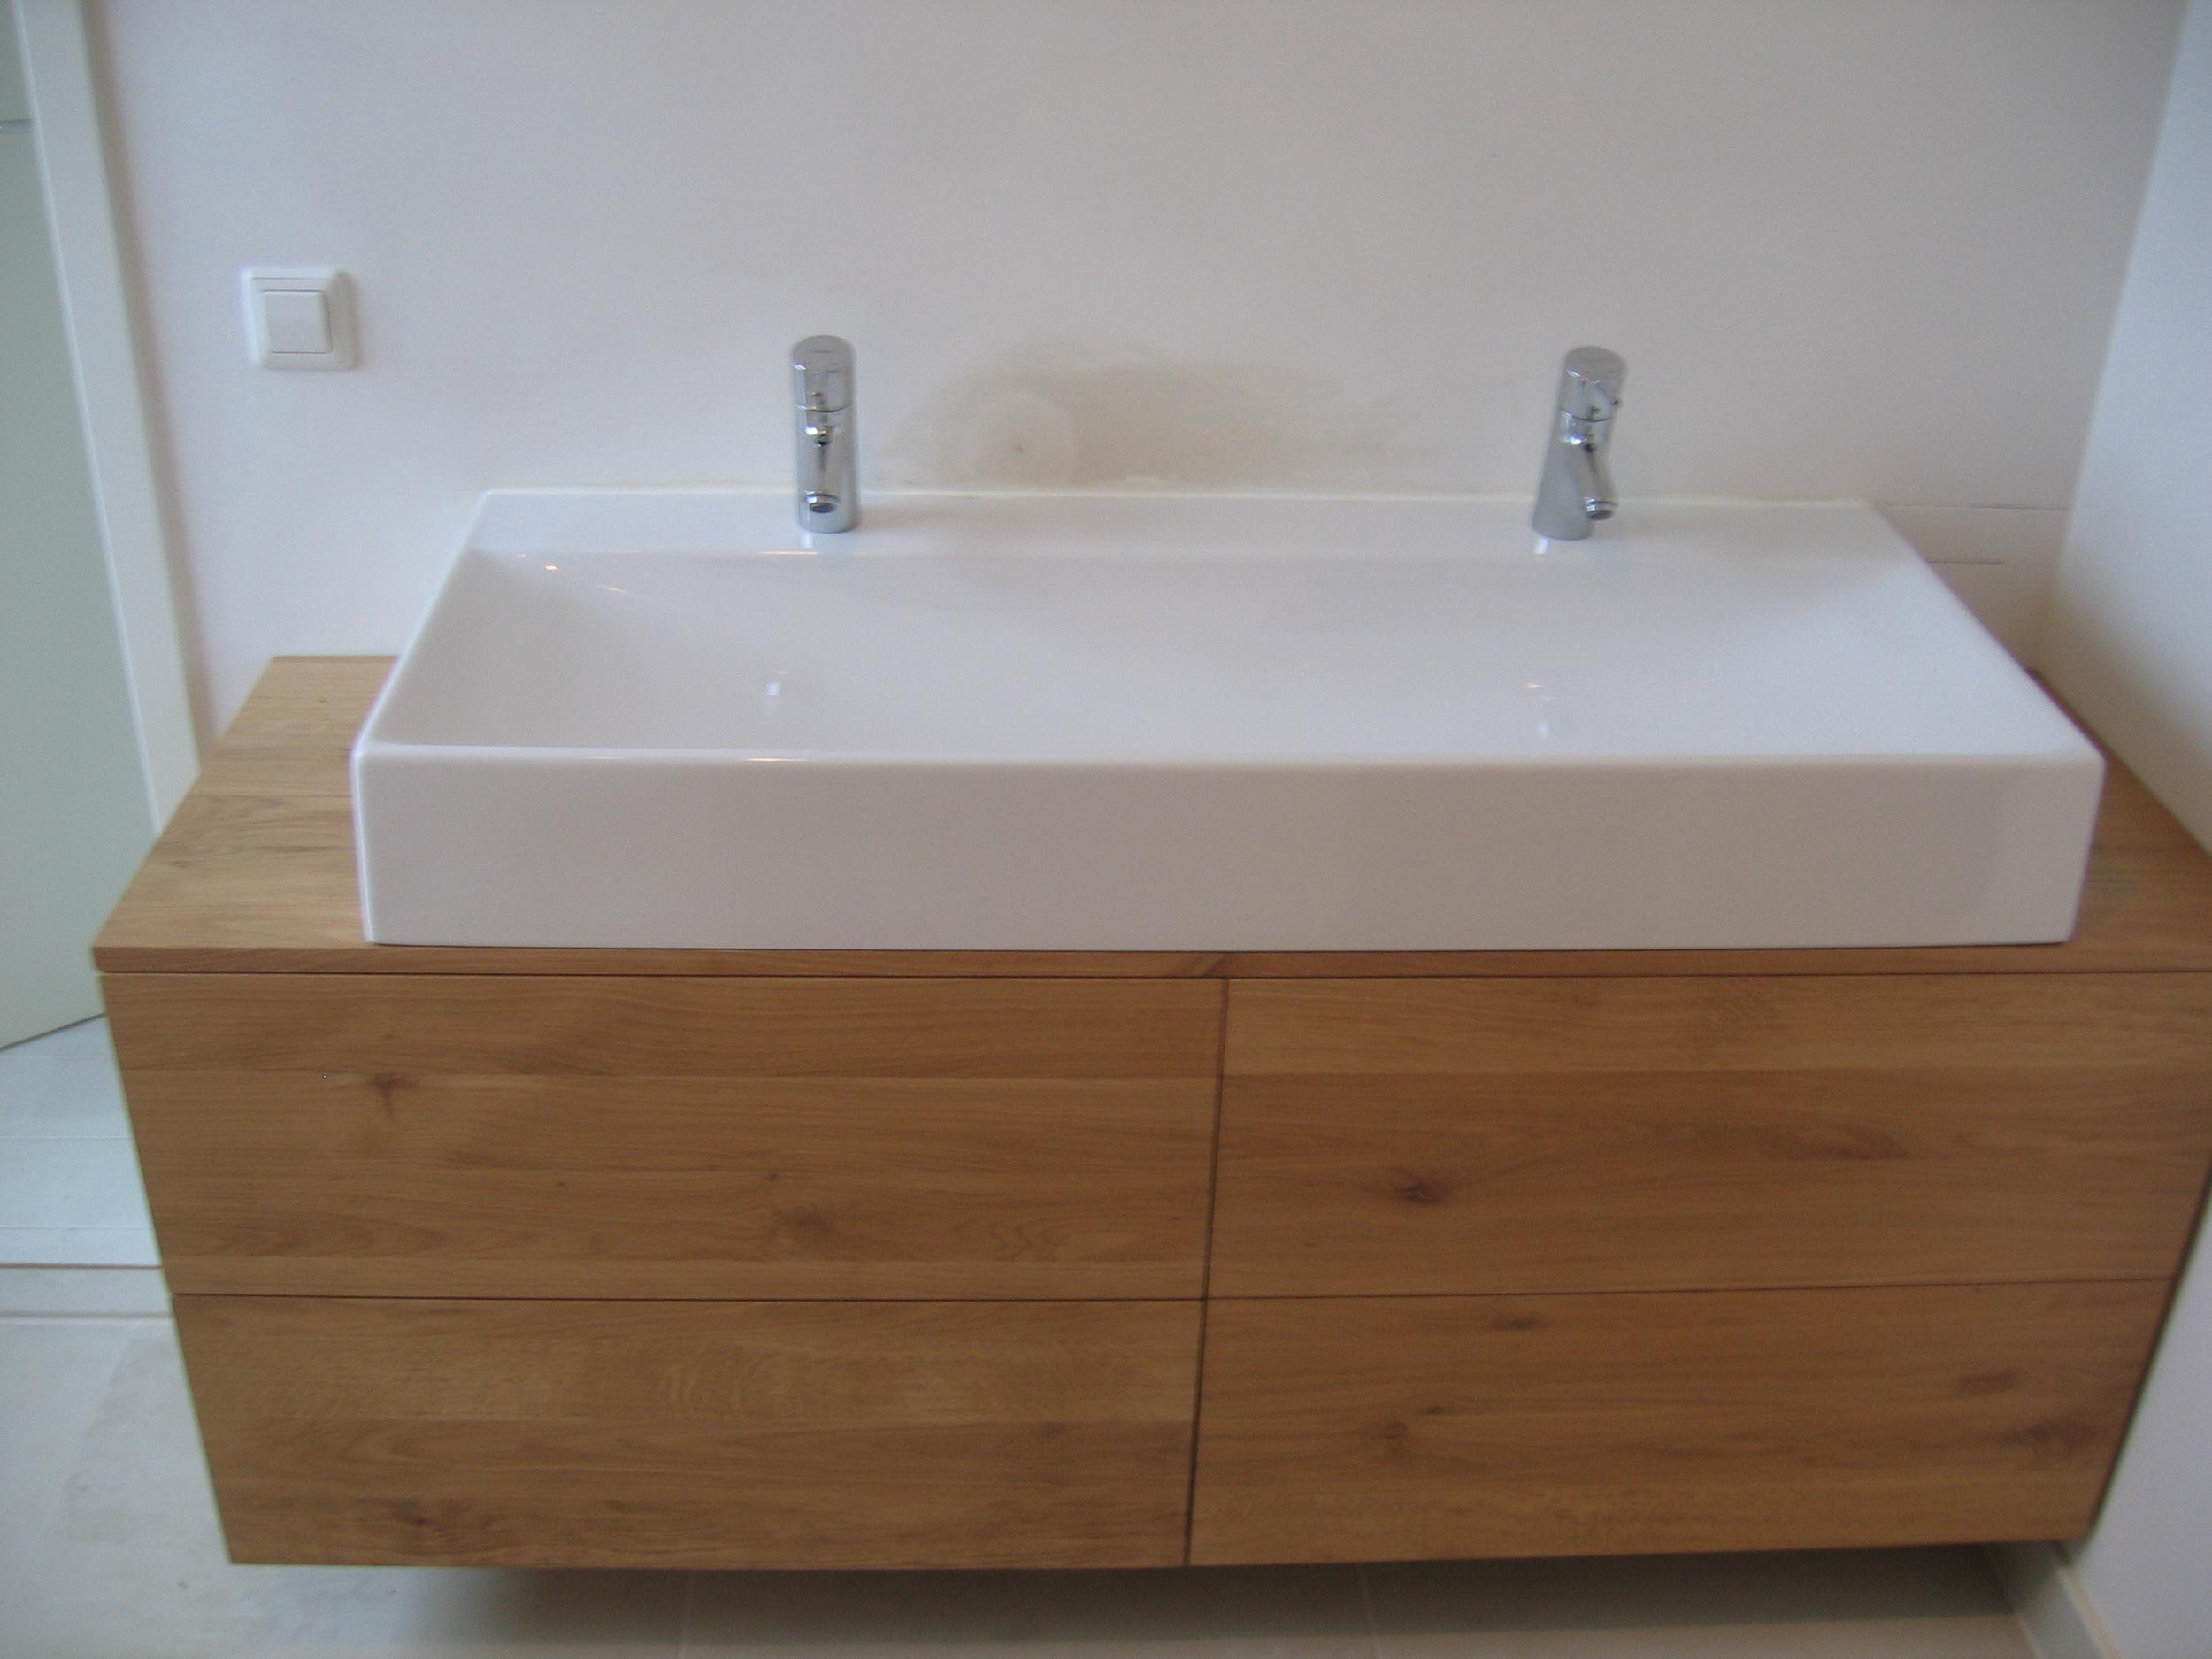 badkamermeubel van massief eikenhout, greeploze lades, licht opaal ingekleurd